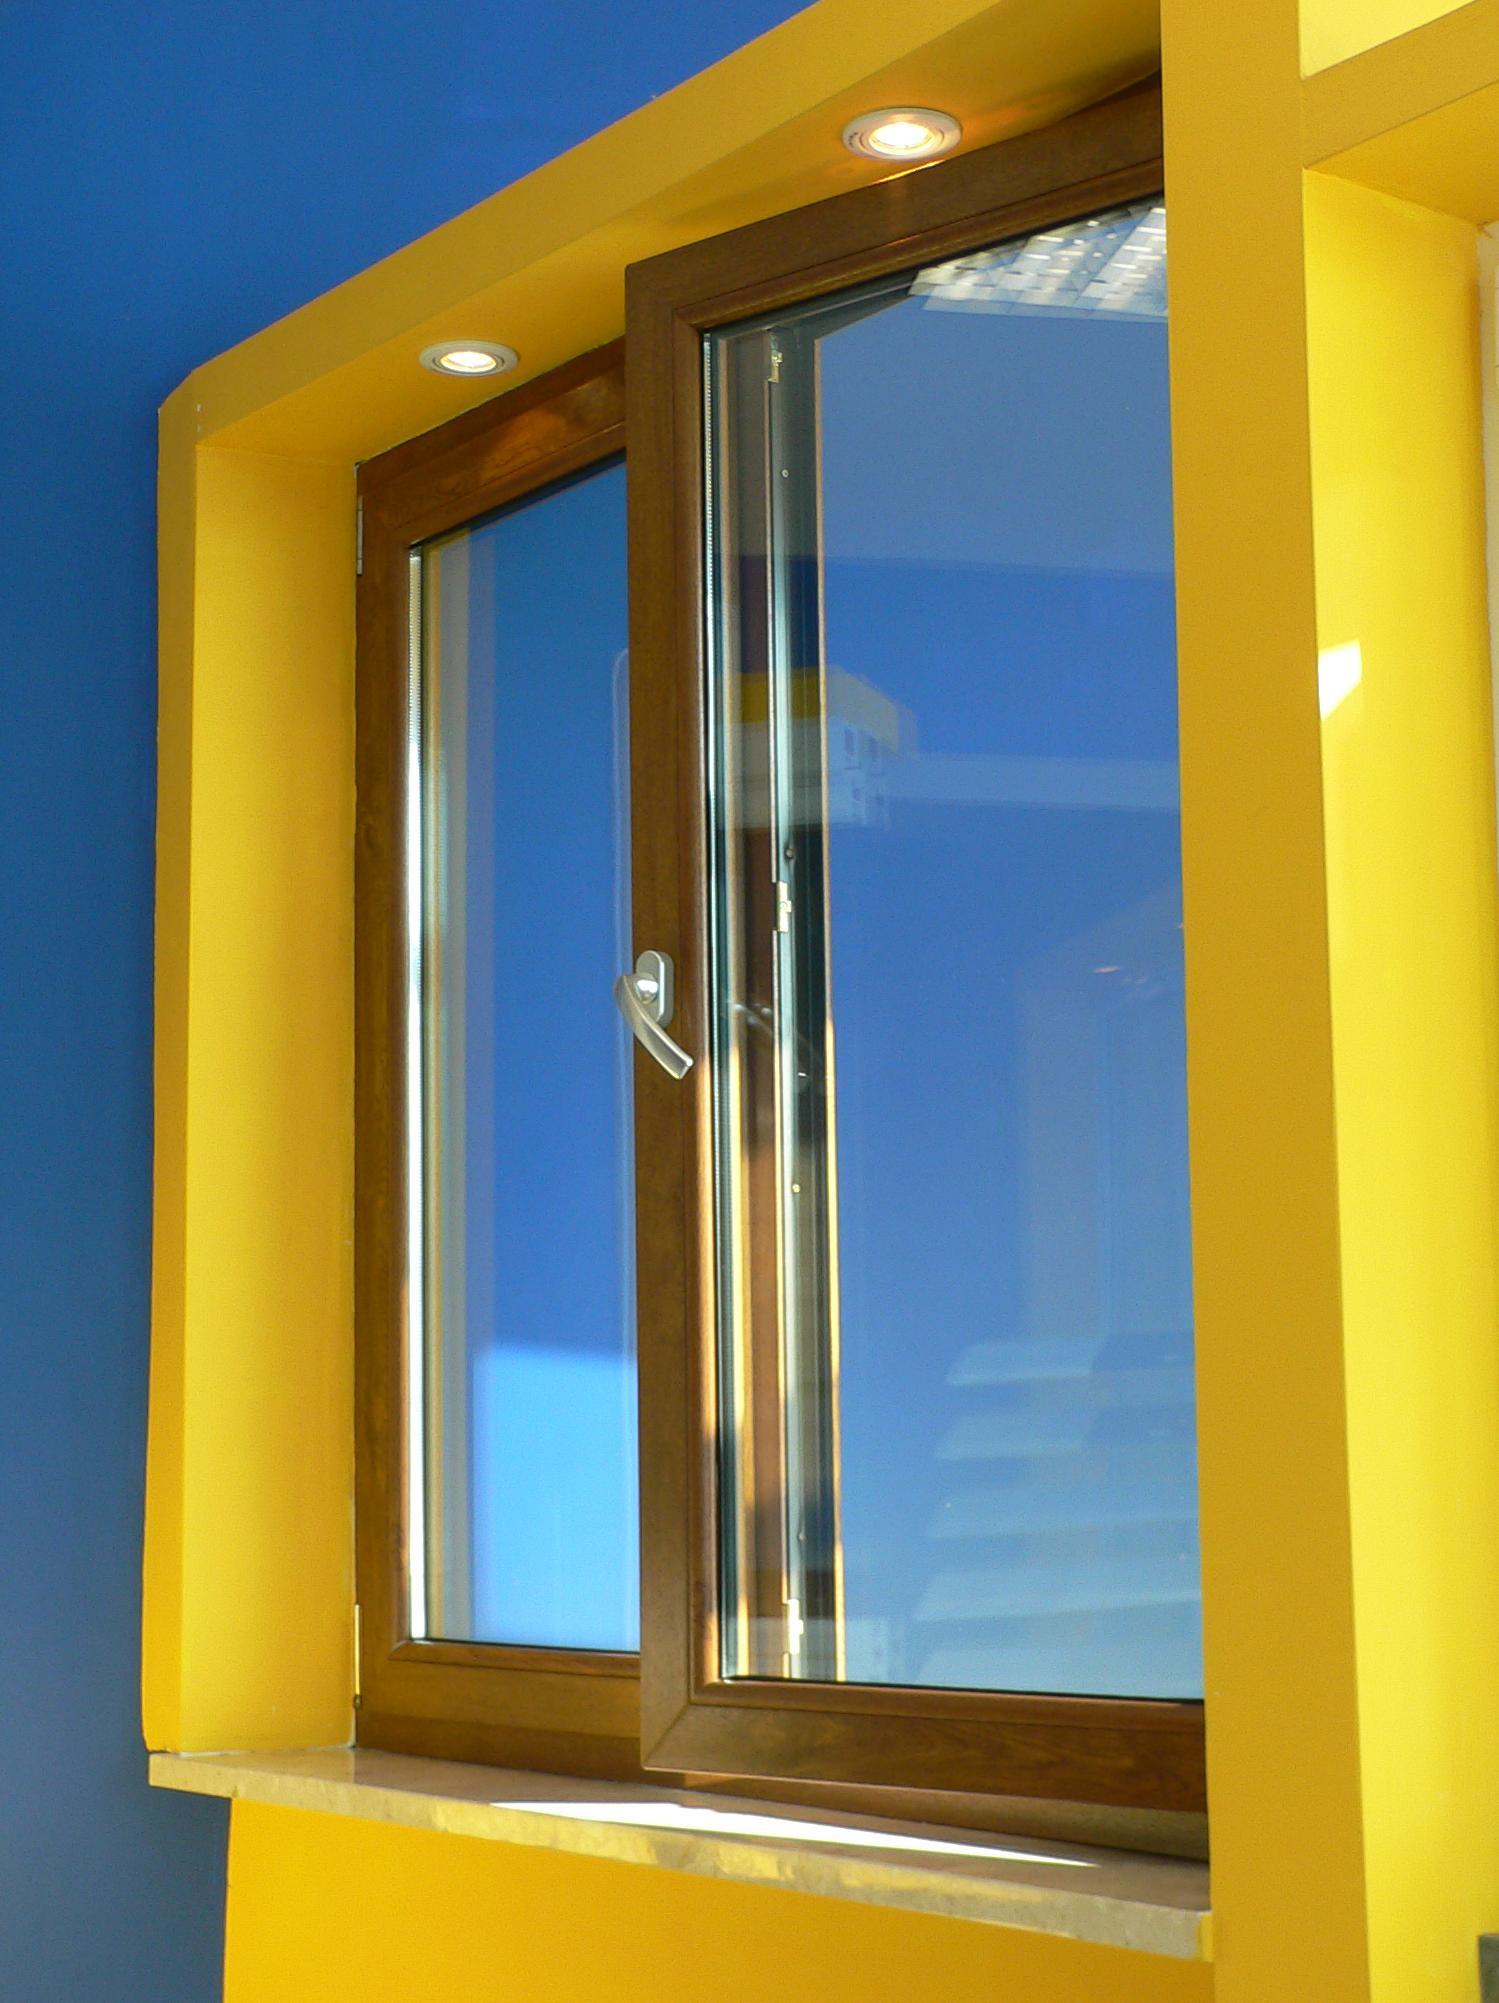 Instalación de ventanas sin obra Girona